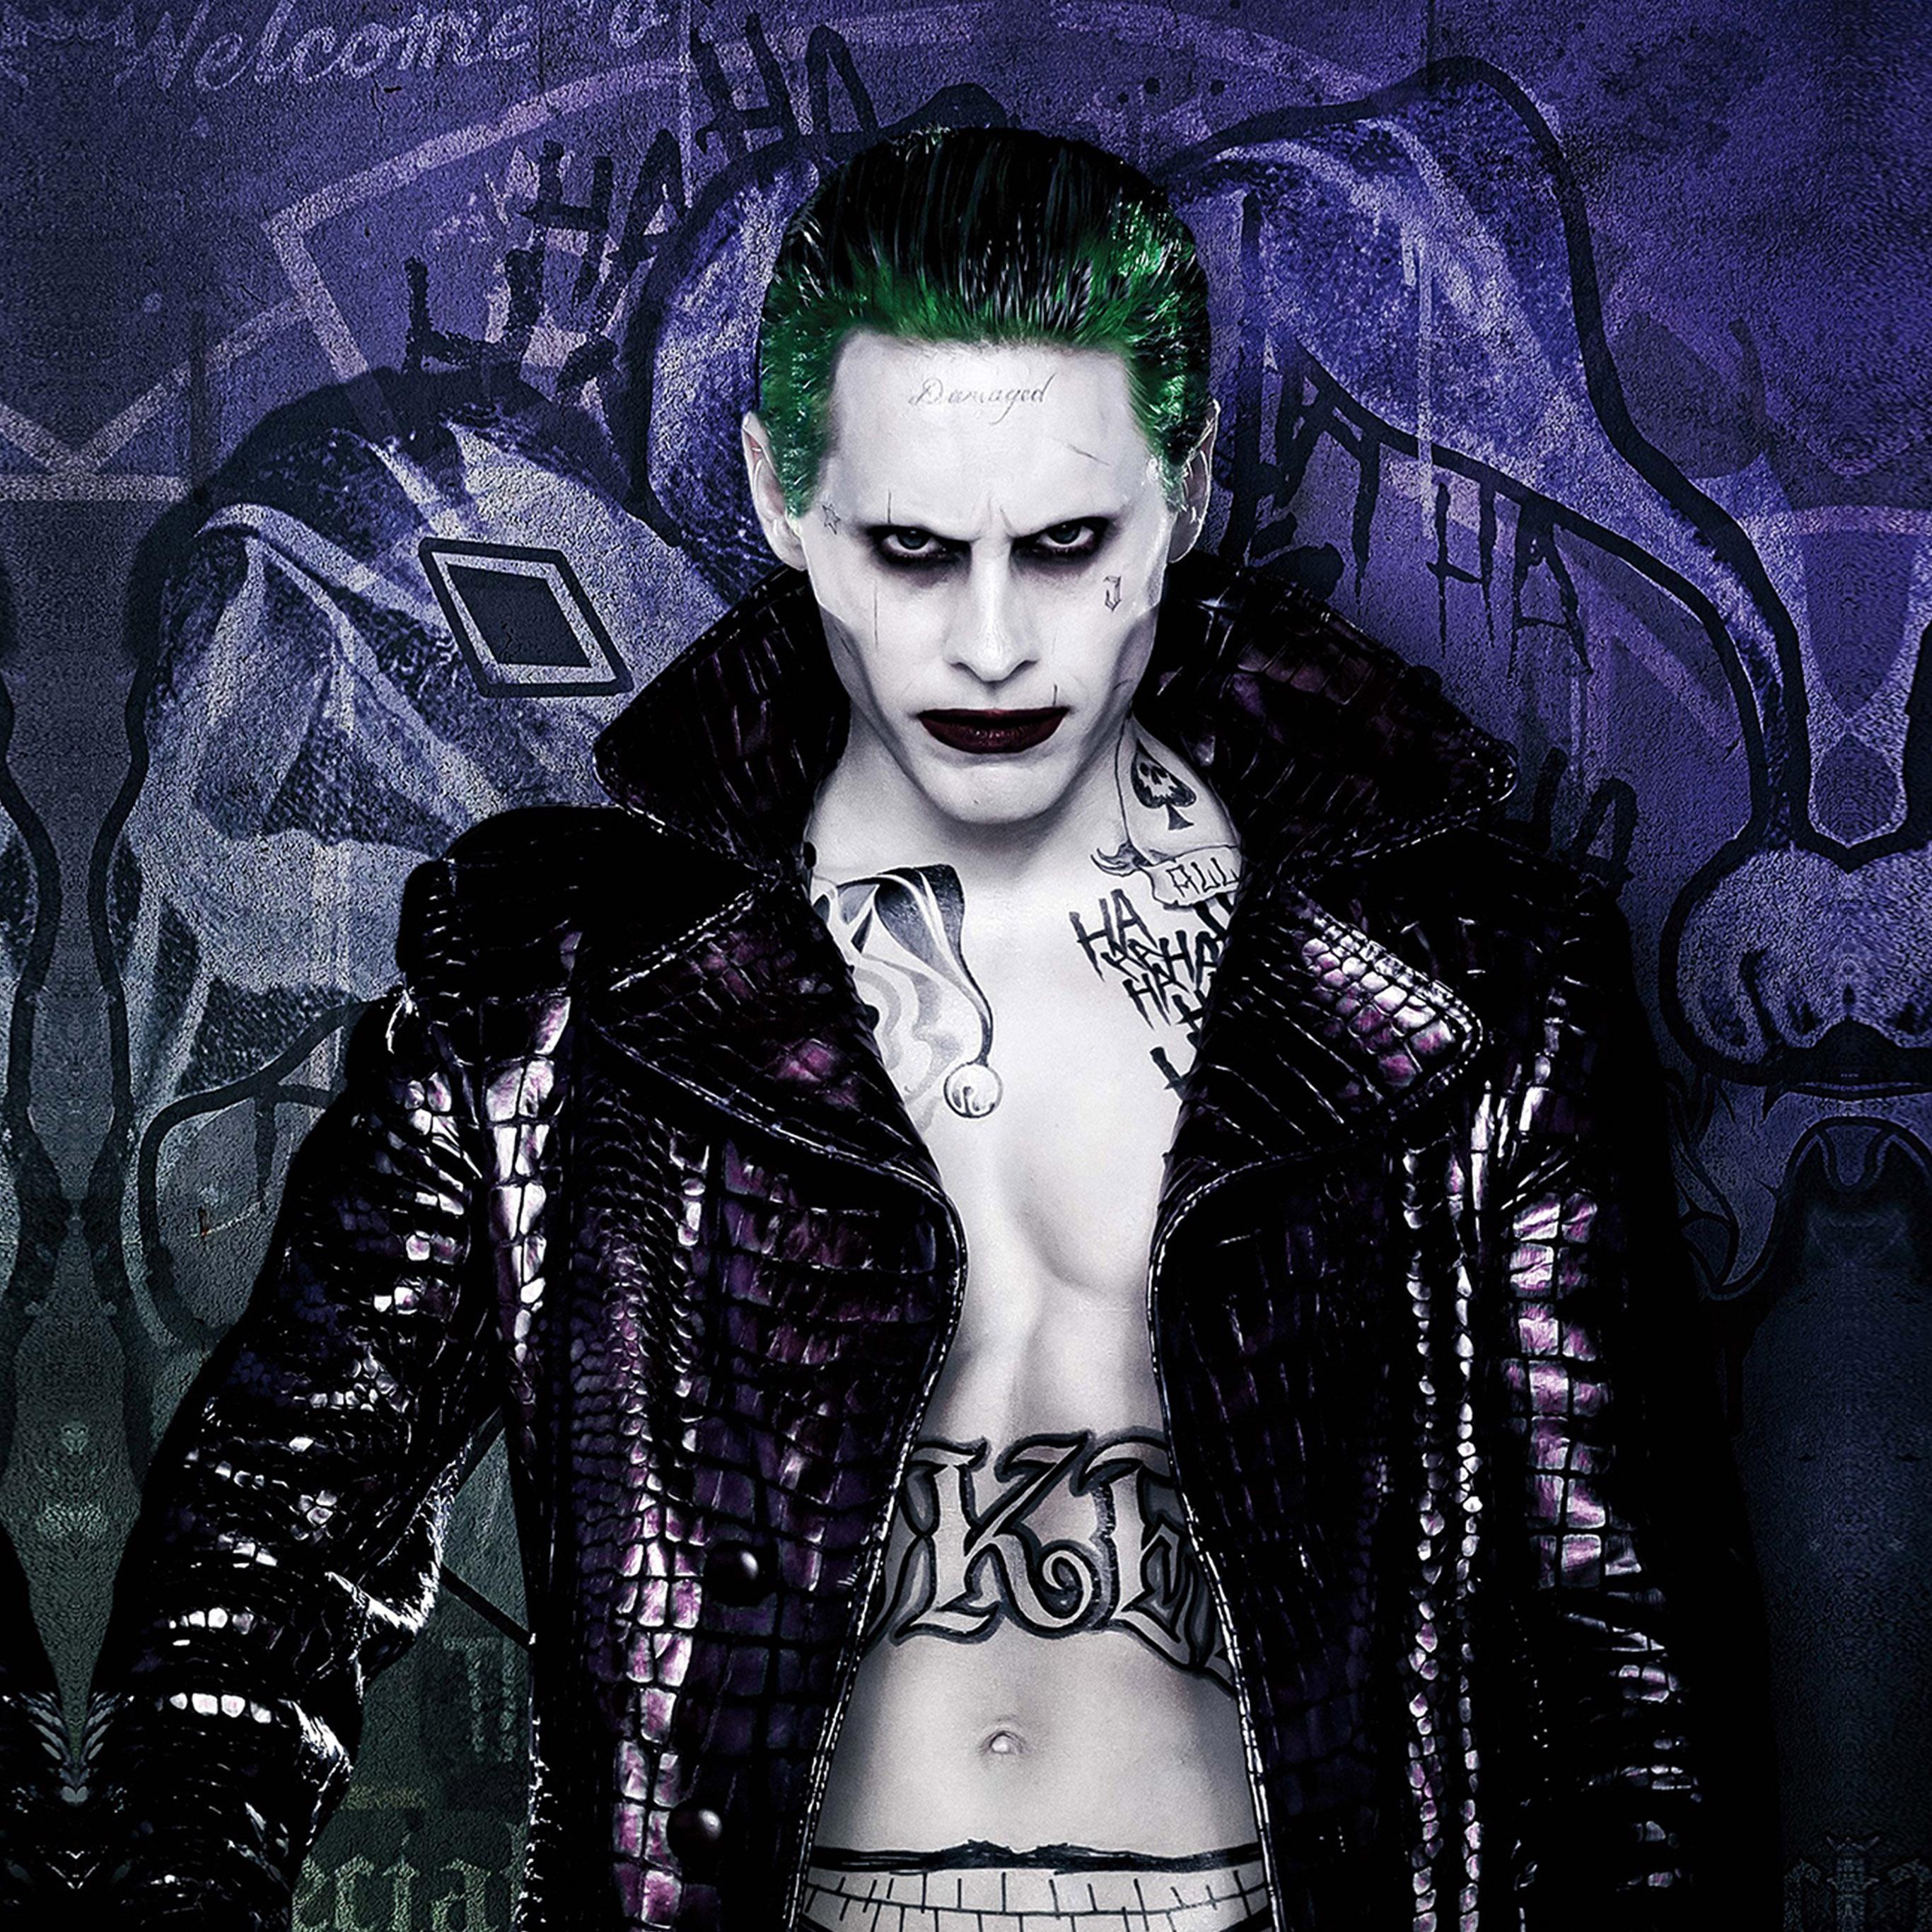 As44 Suicide Squad Jared Leto Art Illustration Joker Wallpaper